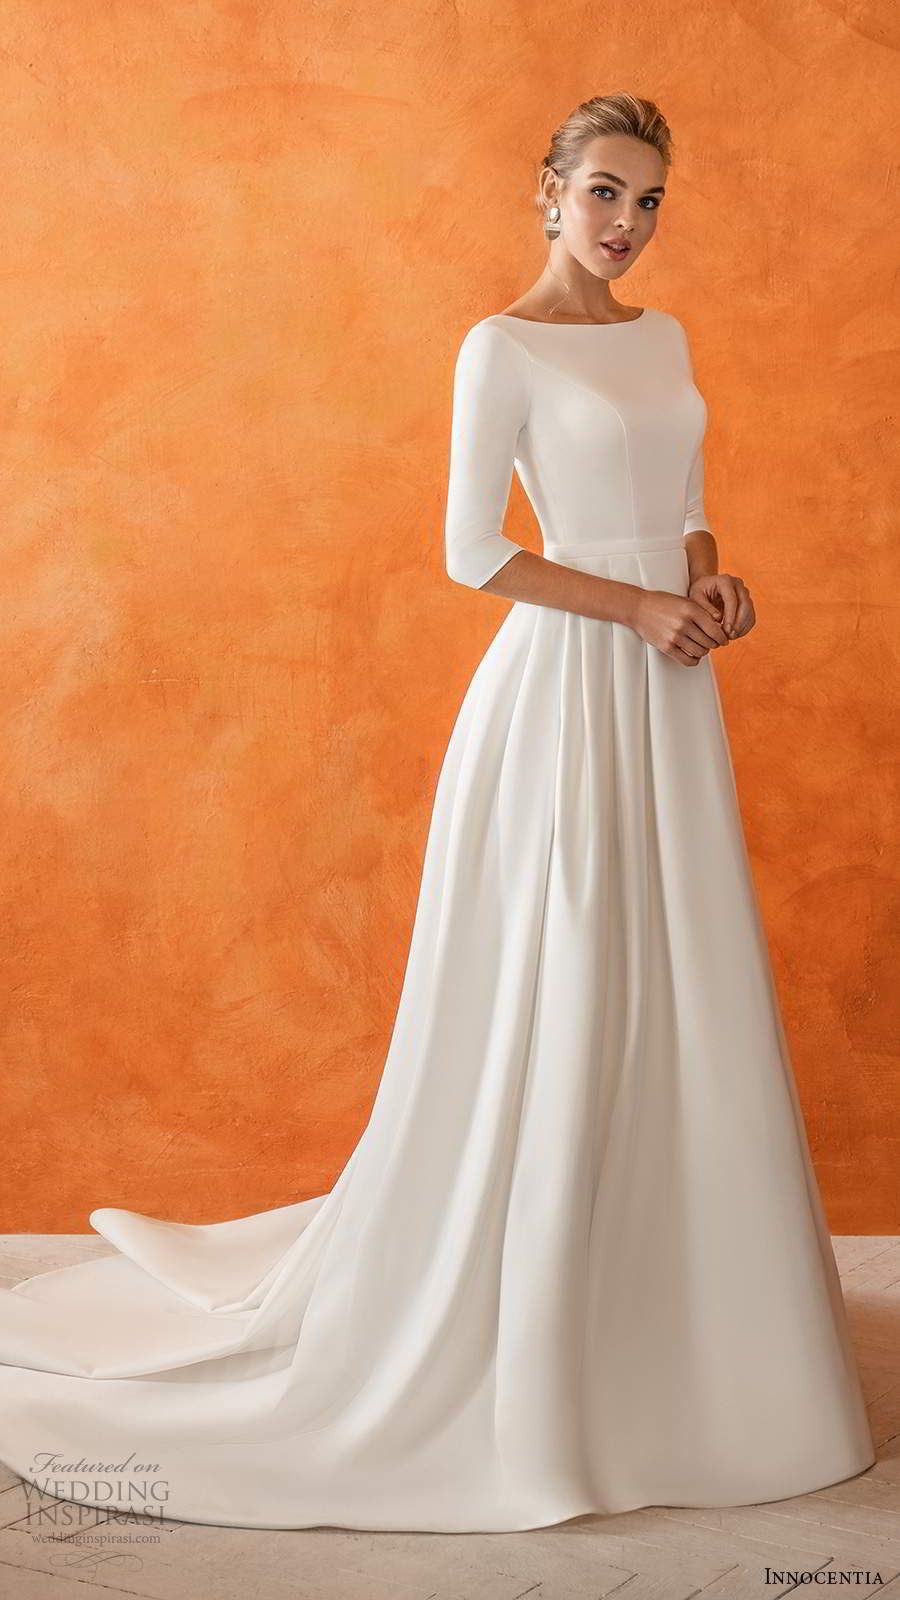 Innocentia 2021 Wedding Dresses Casablanca Bridal Collection Wedding Inspirasi Modest Wedding Dresses Wedding Dress Long Sleeve Wedding Dress Sleeves [ 1600 x 900 Pixel ]